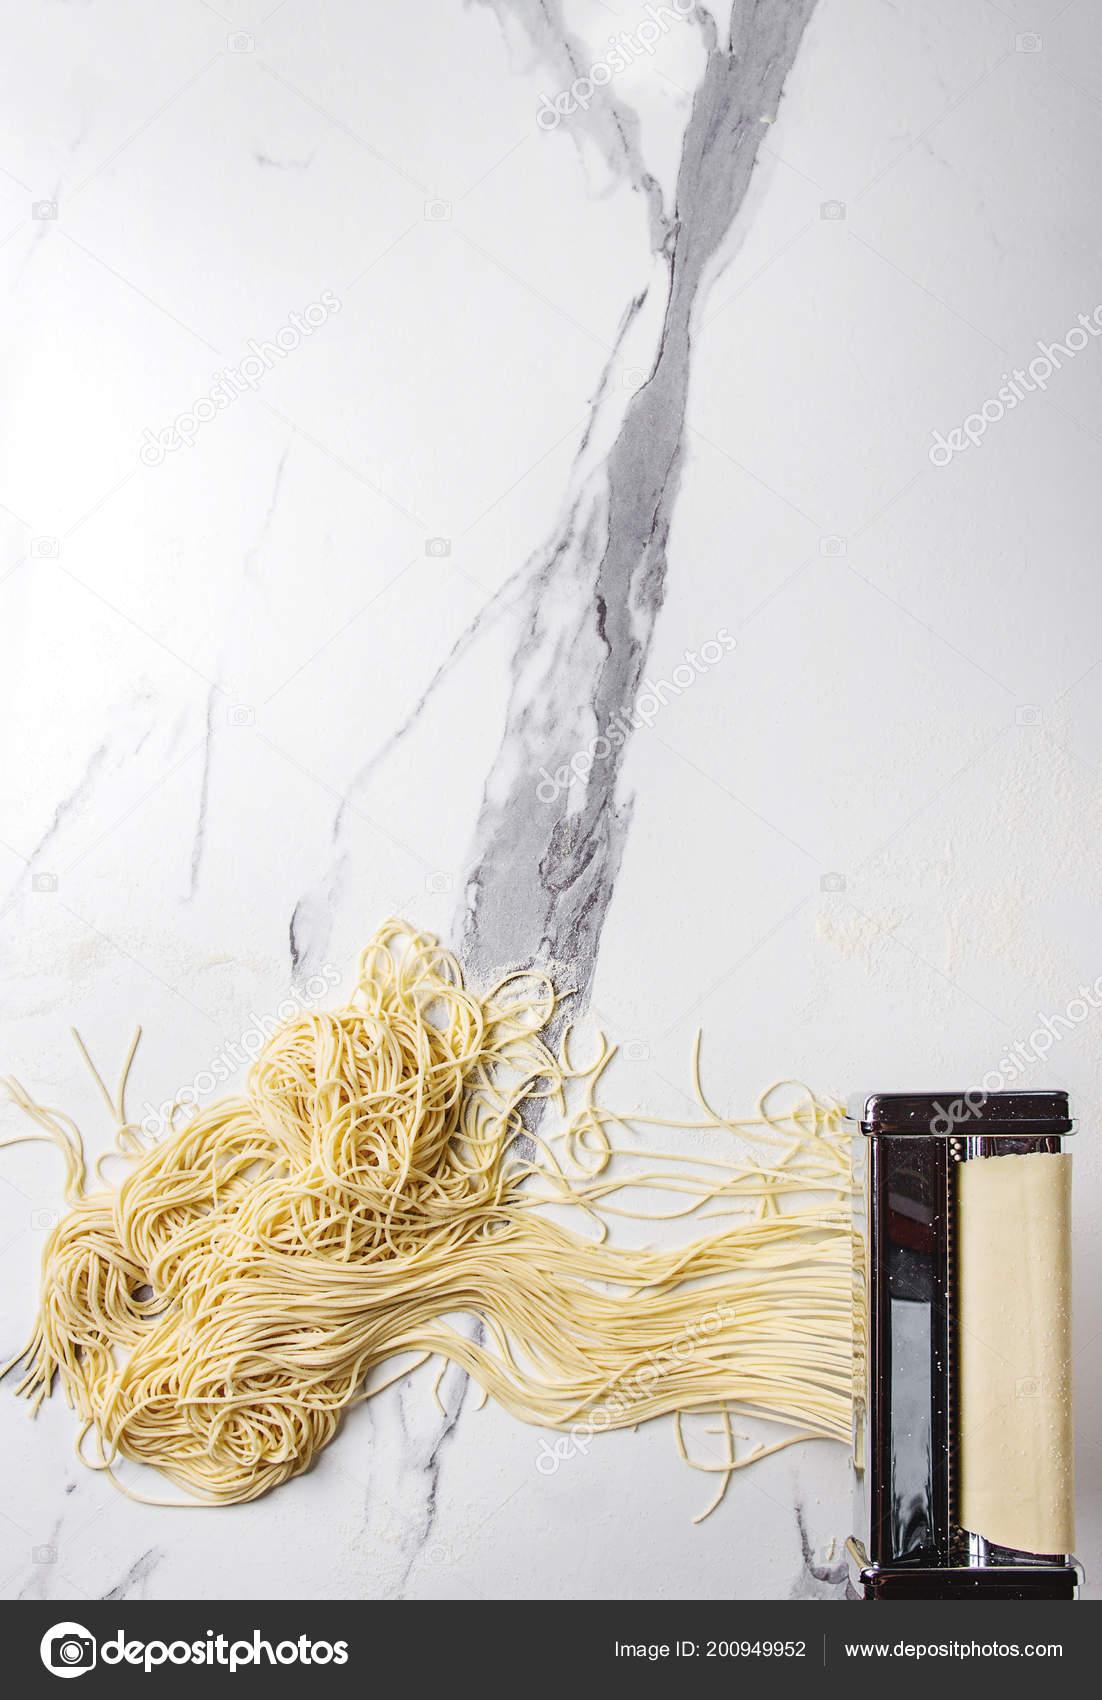 Rolled Dough Homemade Italian Uncooked Pasta Spaghetti Pasta Machine